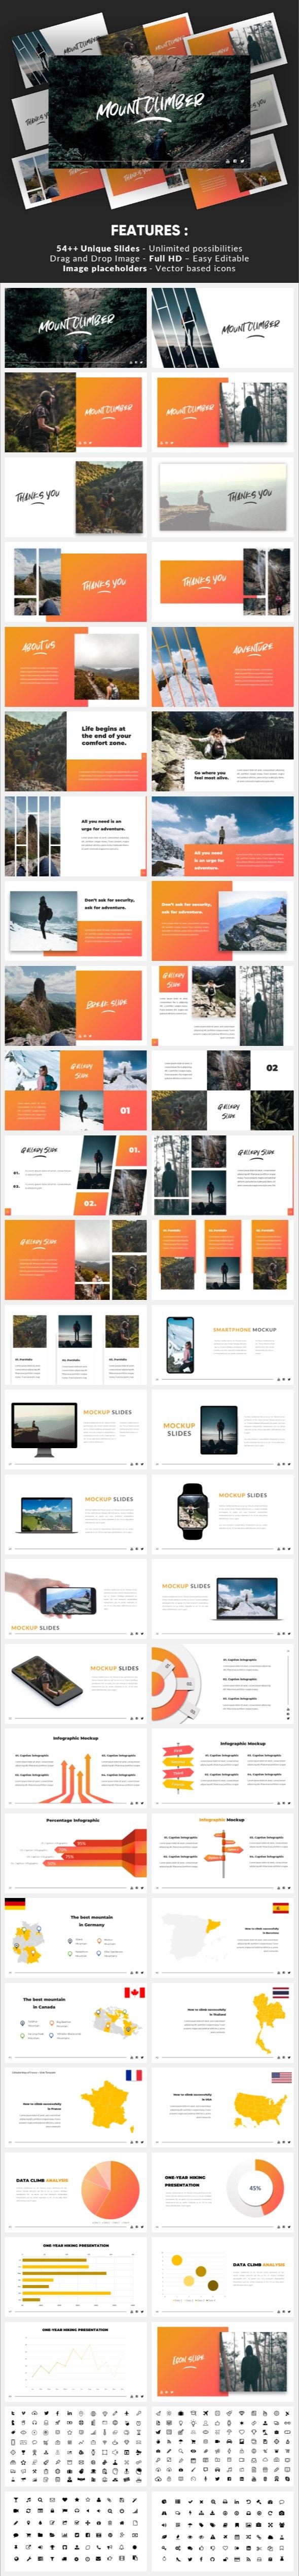 Mountclimb - Traveling Vacation Powerpoint Template - Business PowerPoint Templates